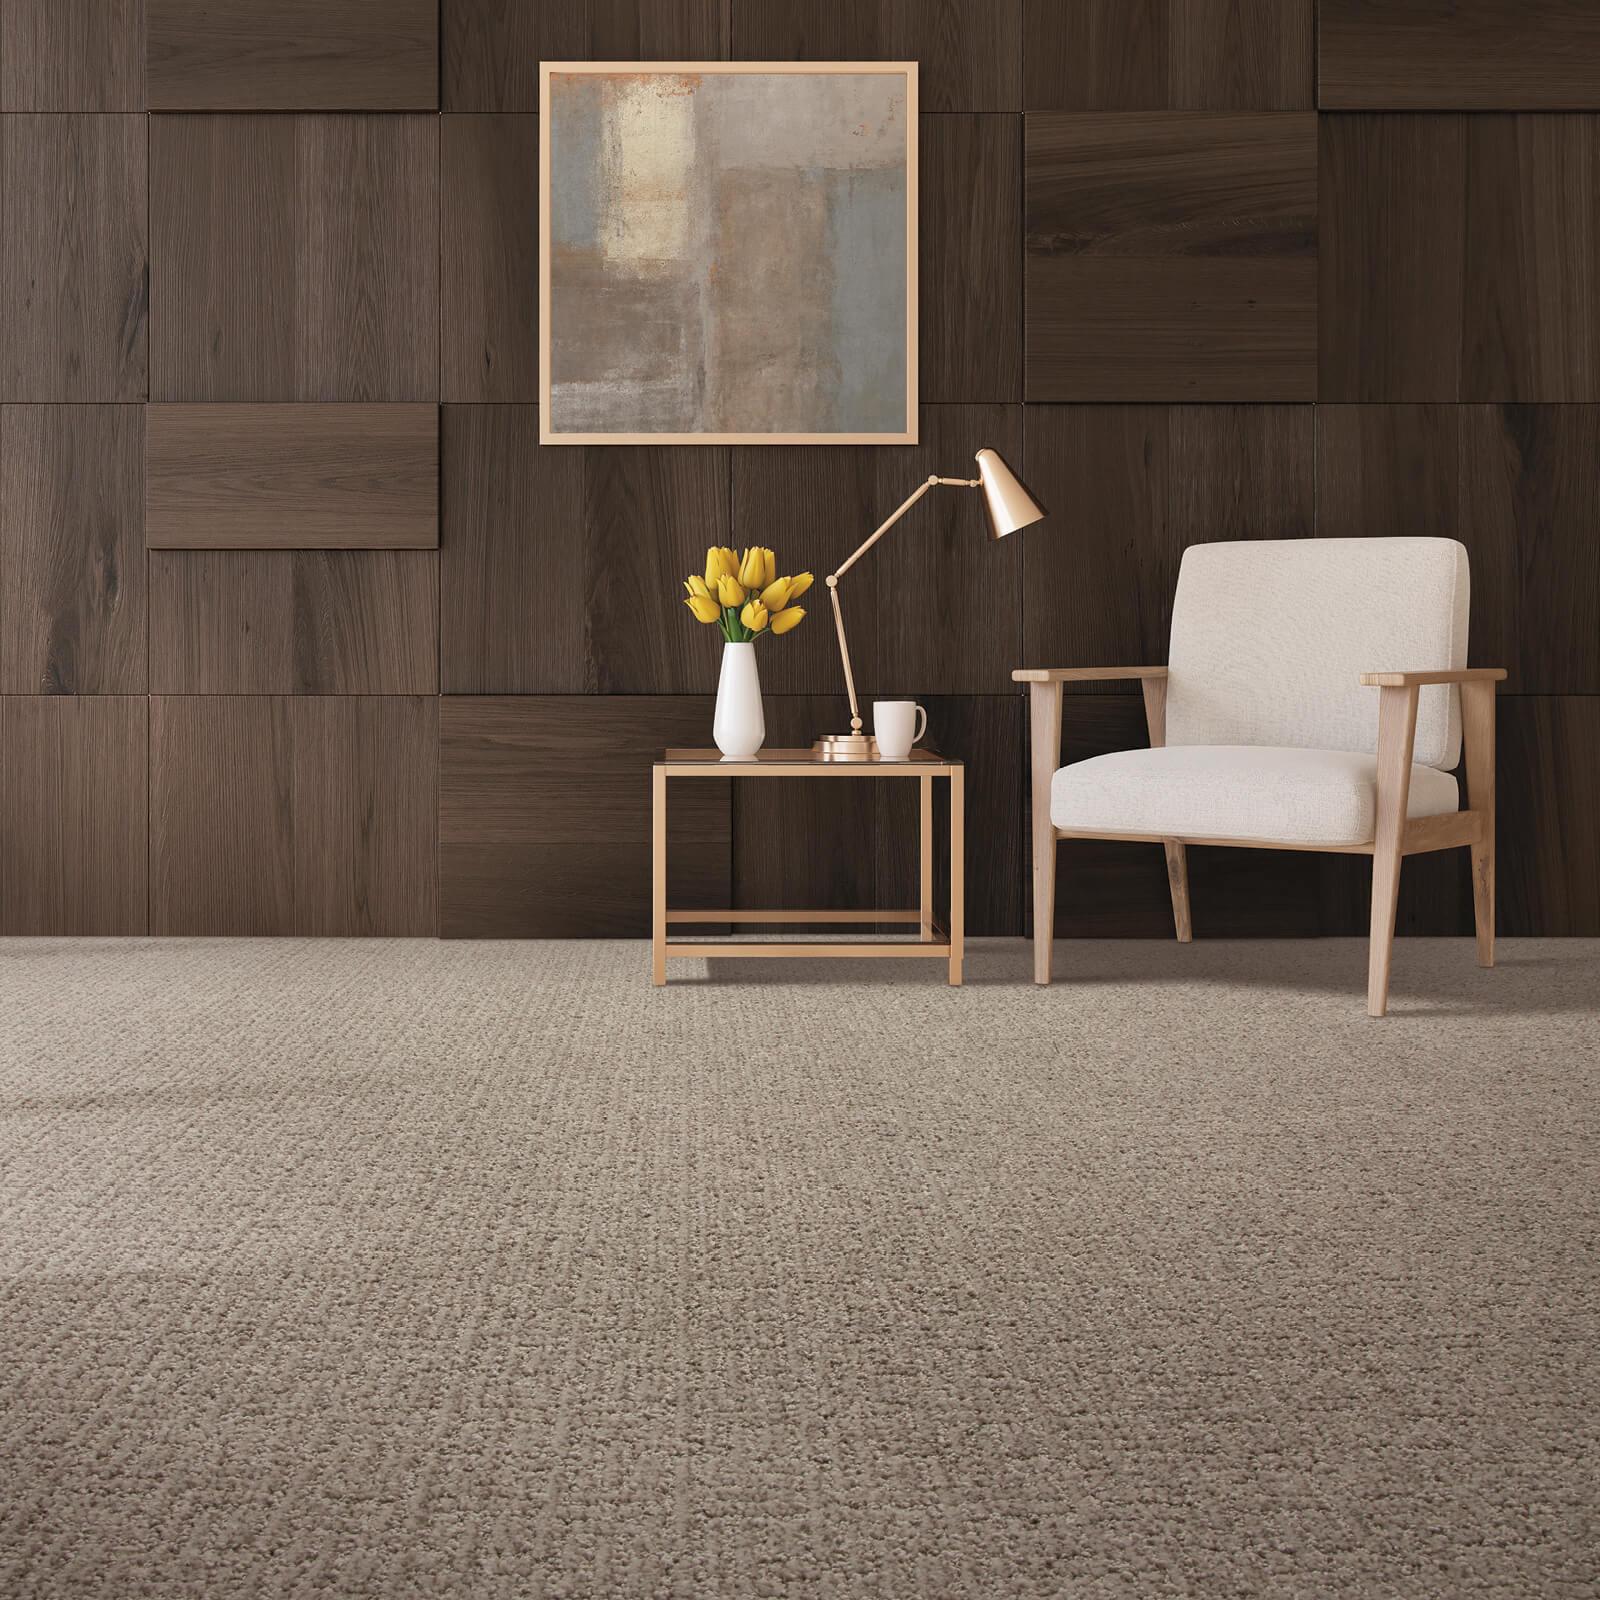 Stylish Edge | Flooring by Wilson's Carpet Plus